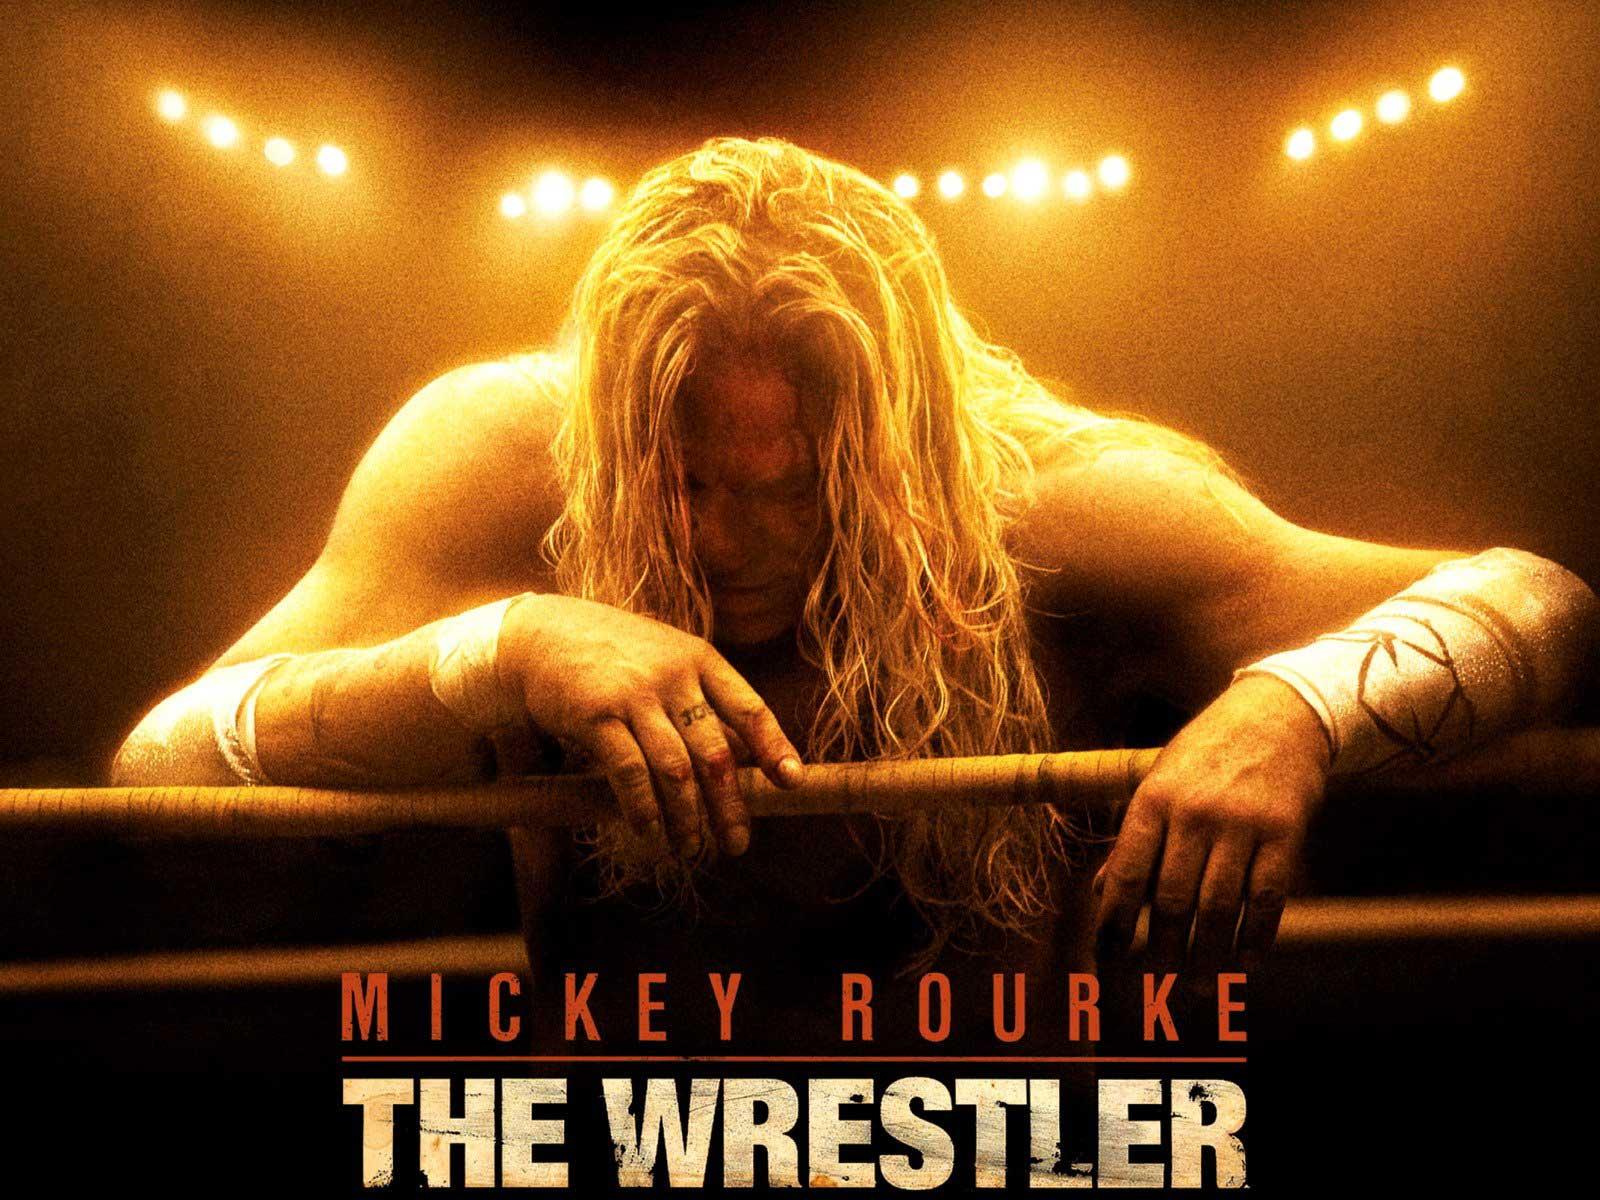 World Wrestling Federation (Aquellos Maravillosos 80's) - Página 3 The%20Wrestler%20-%20Mickey%20Rourke%20-3